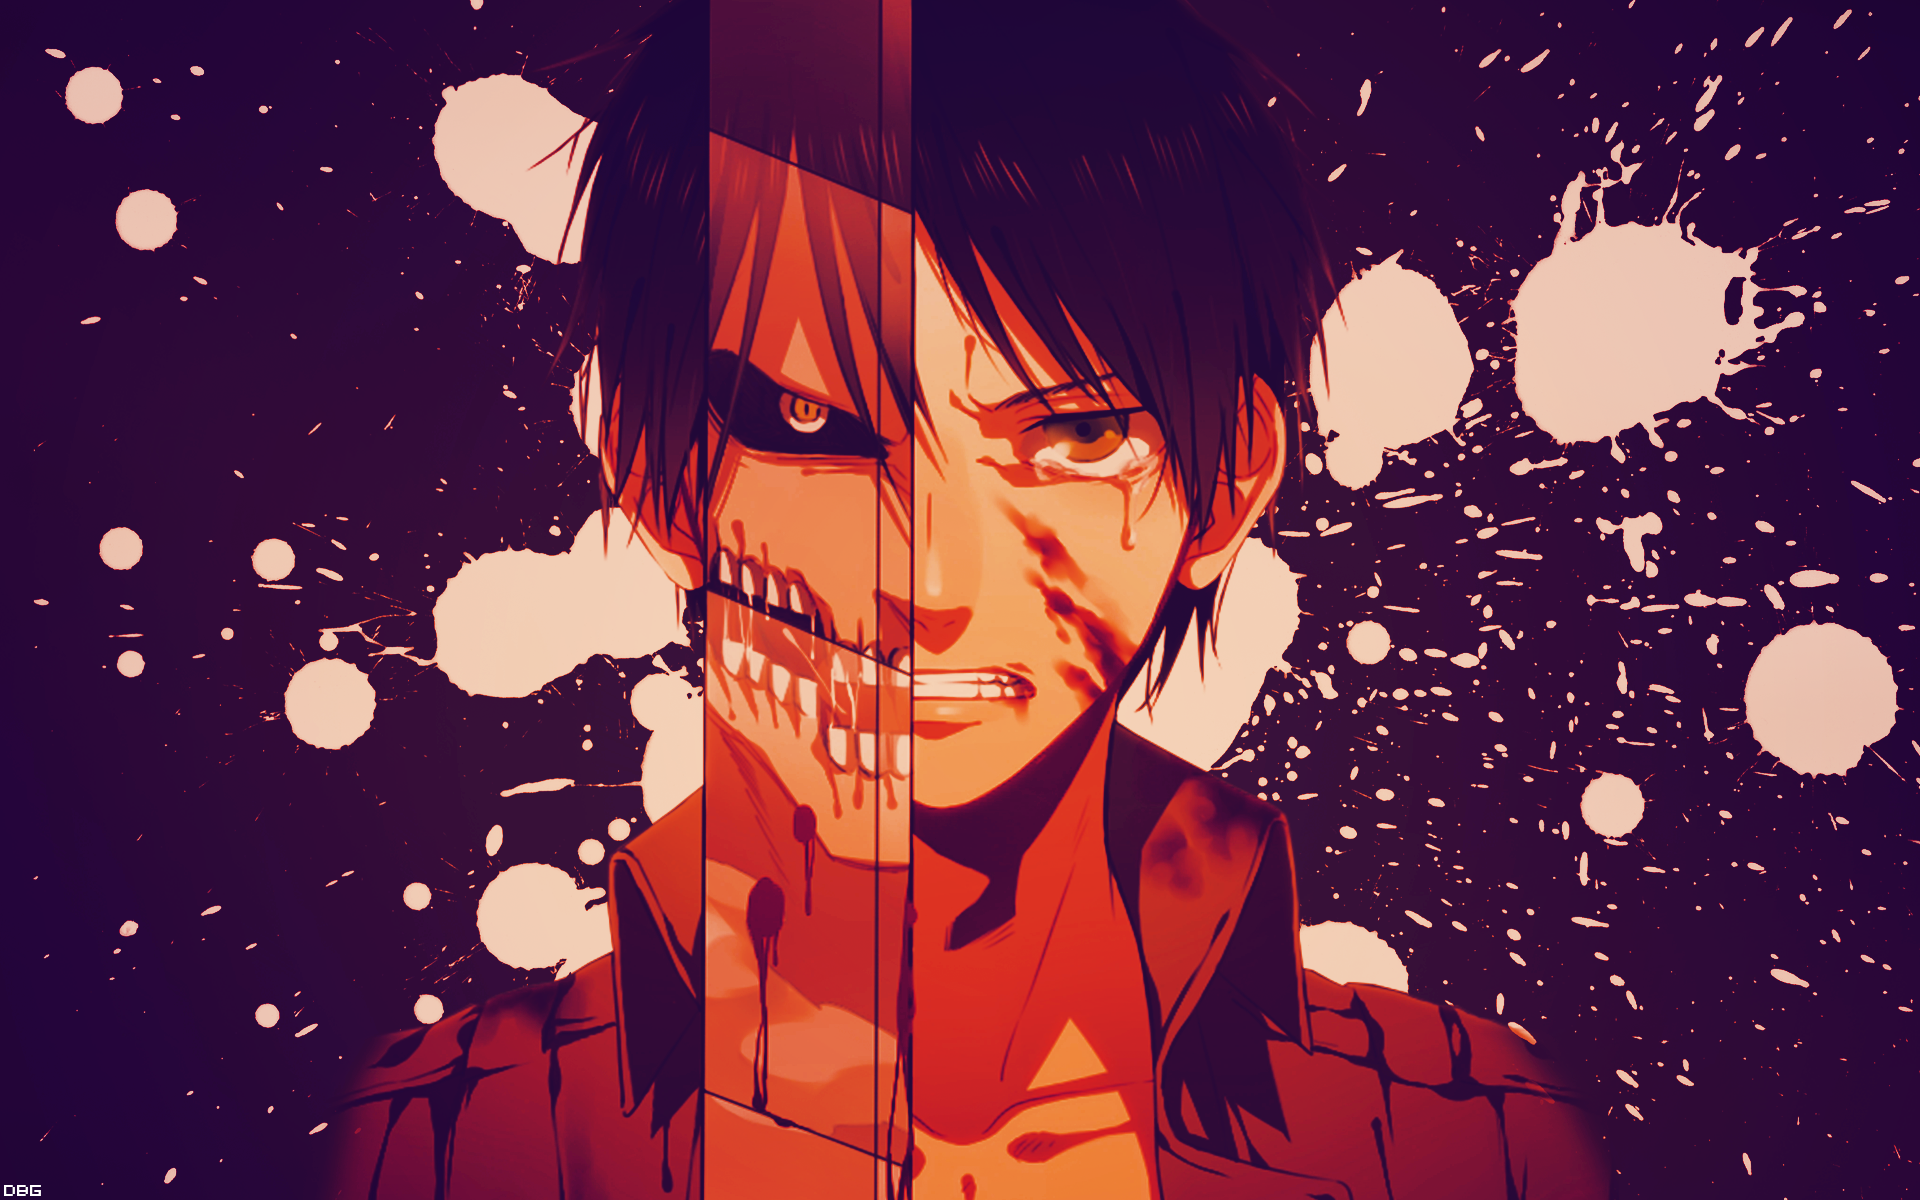 Shingeki No Kyojin Eren Wallpaper by DeathB00K on DeviantArt